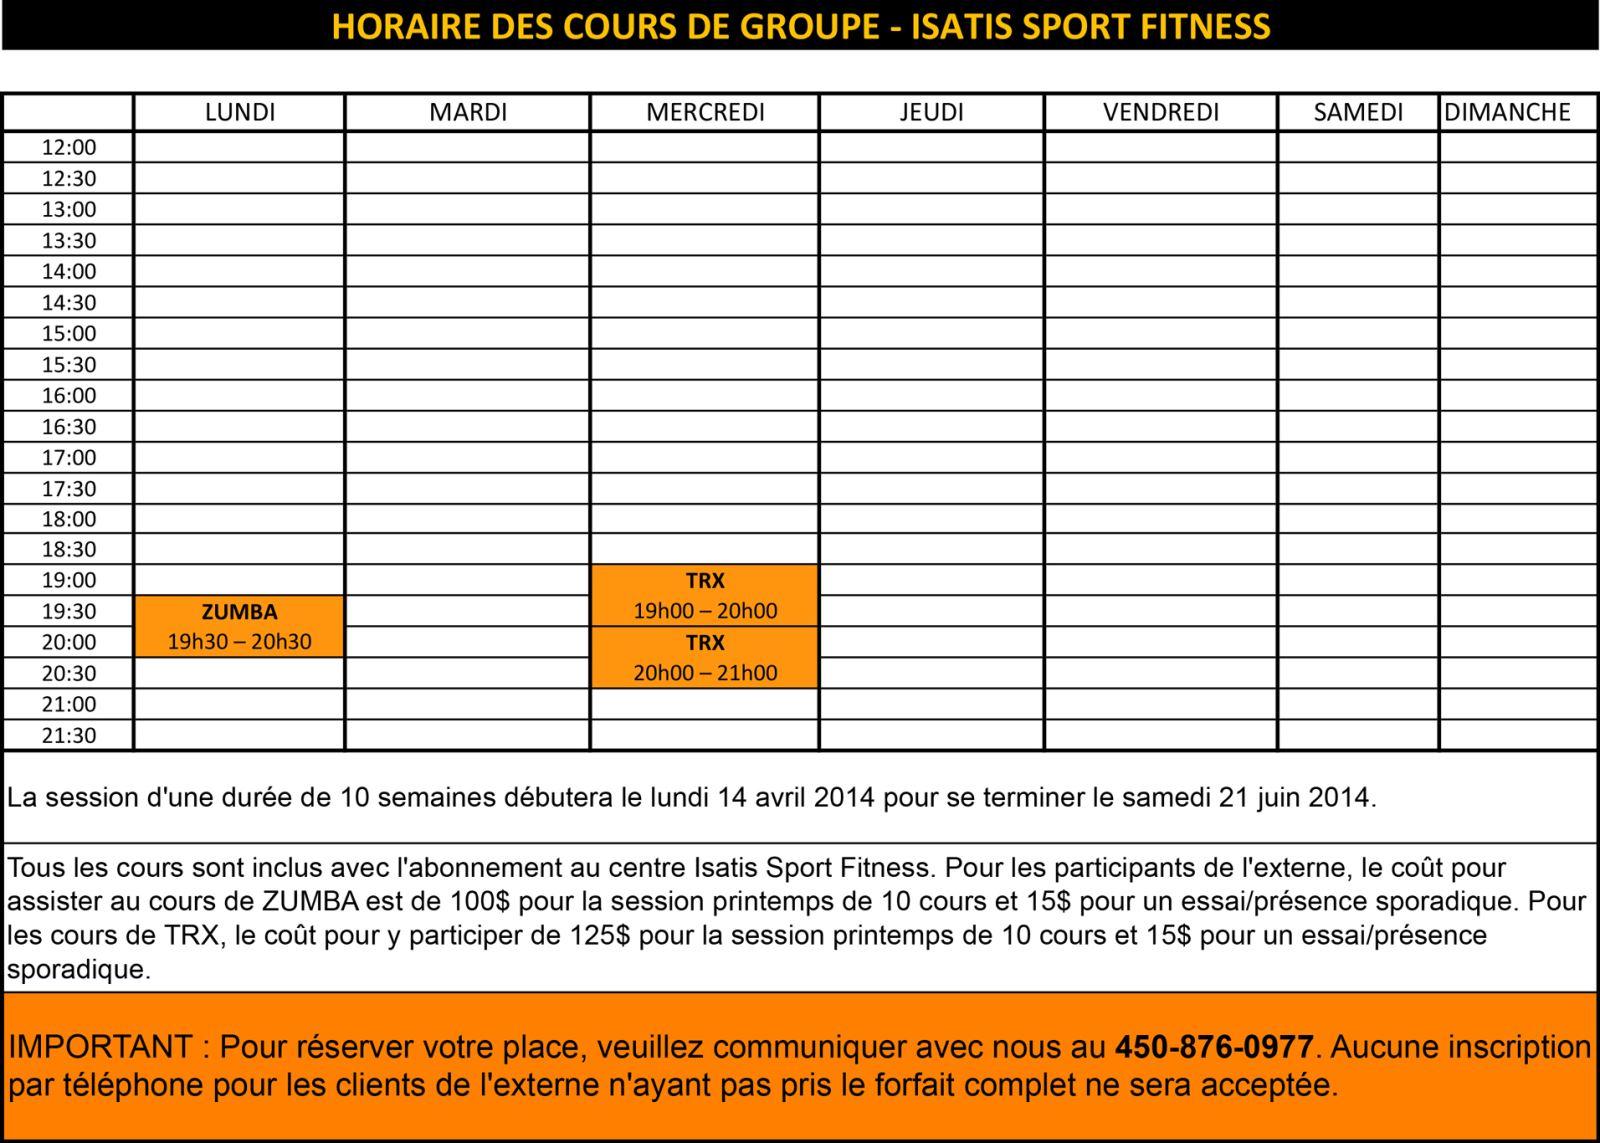 horaire des cours isatis sport fitness printemps 2014 isatis sport fitness. Black Bedroom Furniture Sets. Home Design Ideas